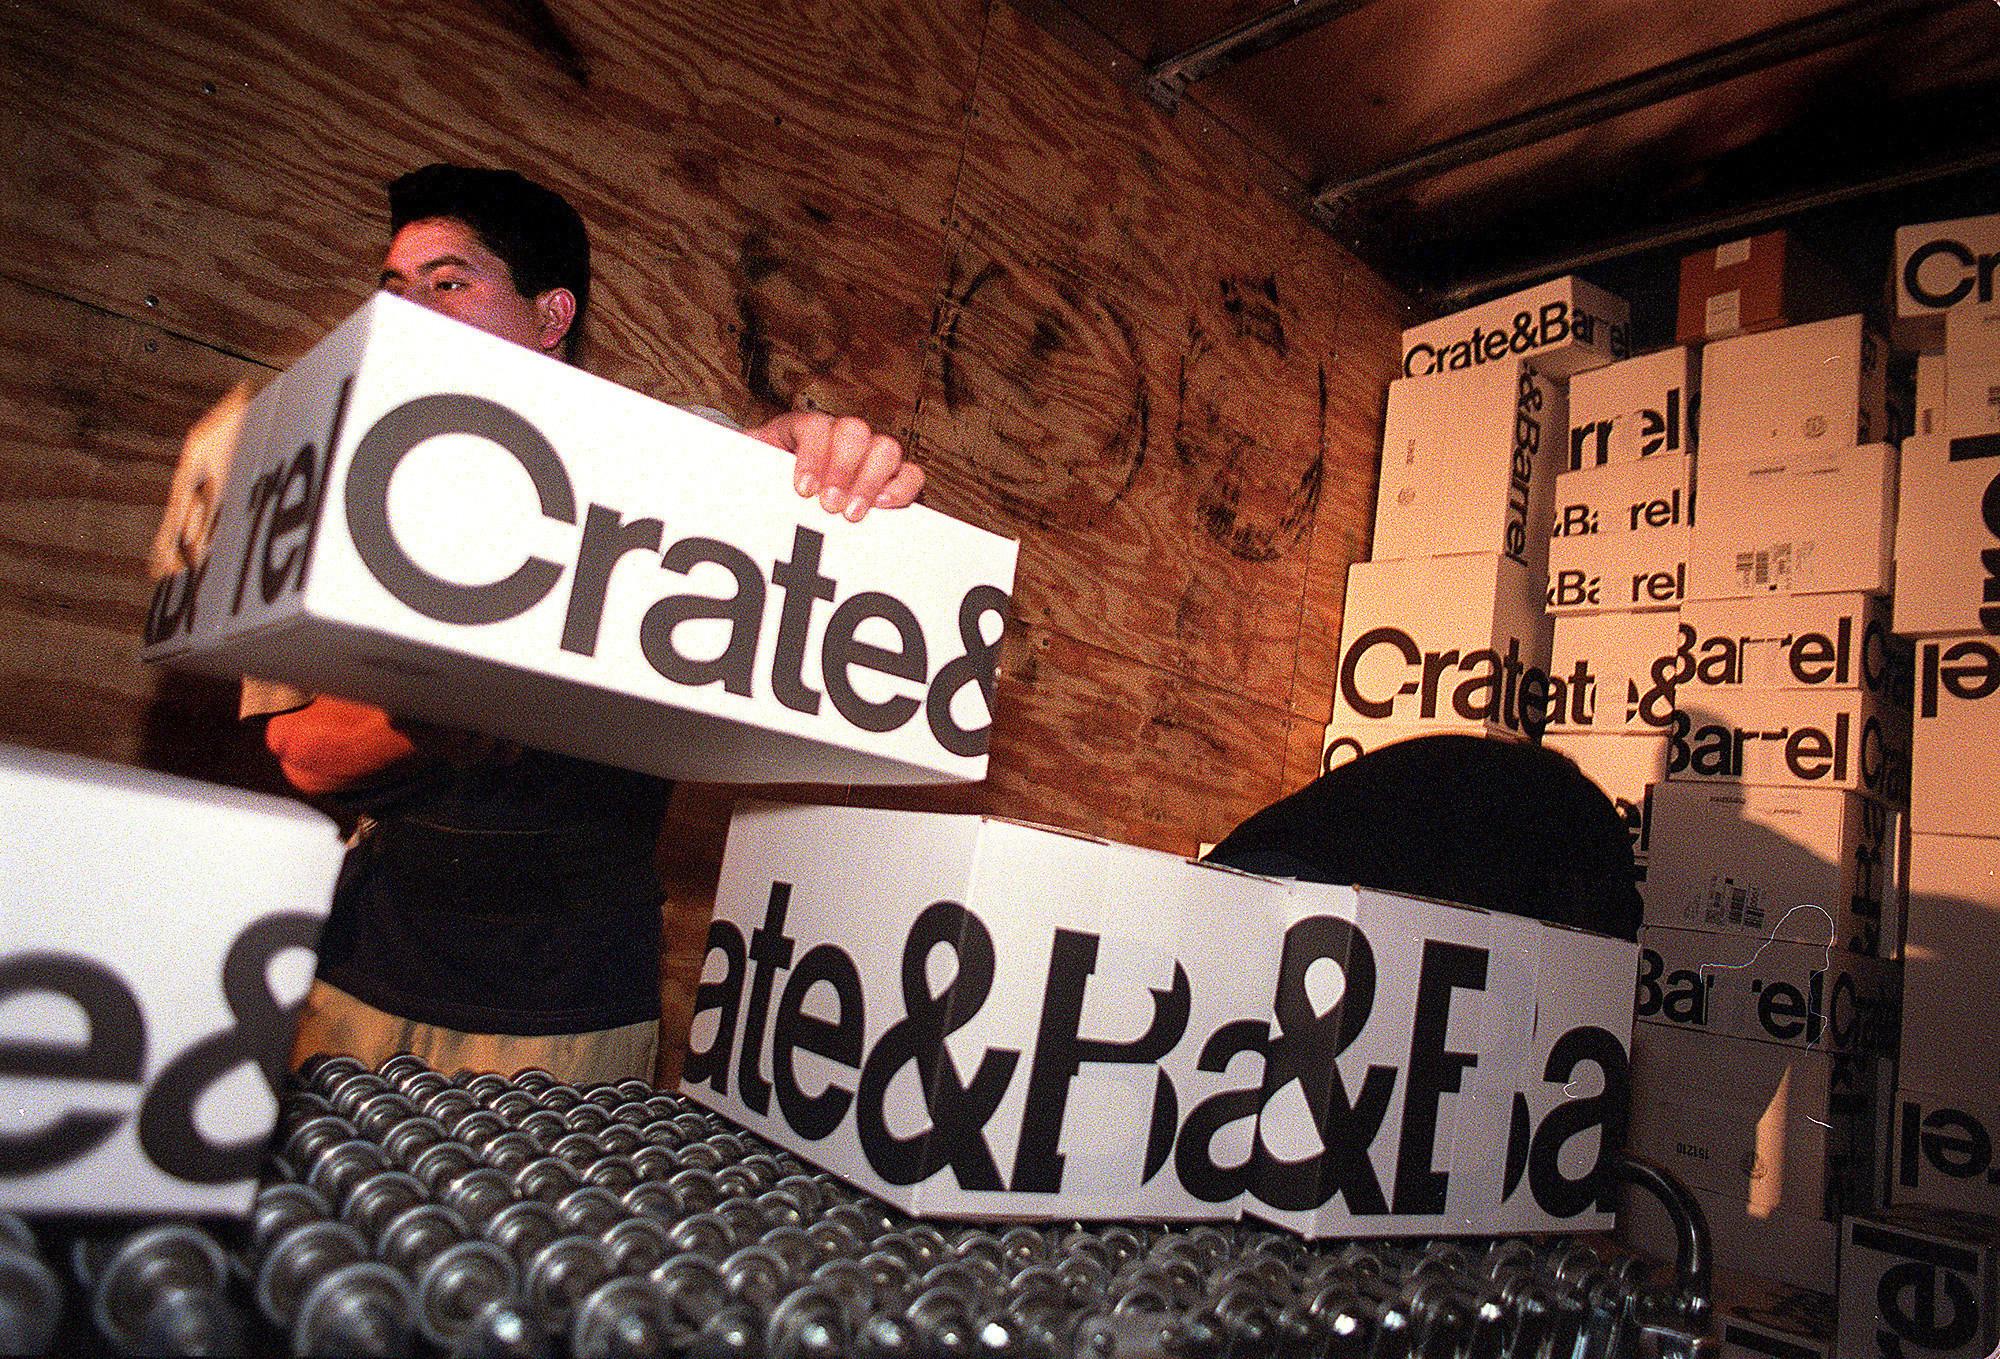 crate and barrel to close new york city flagship chicago tribune. Black Bedroom Furniture Sets. Home Design Ideas